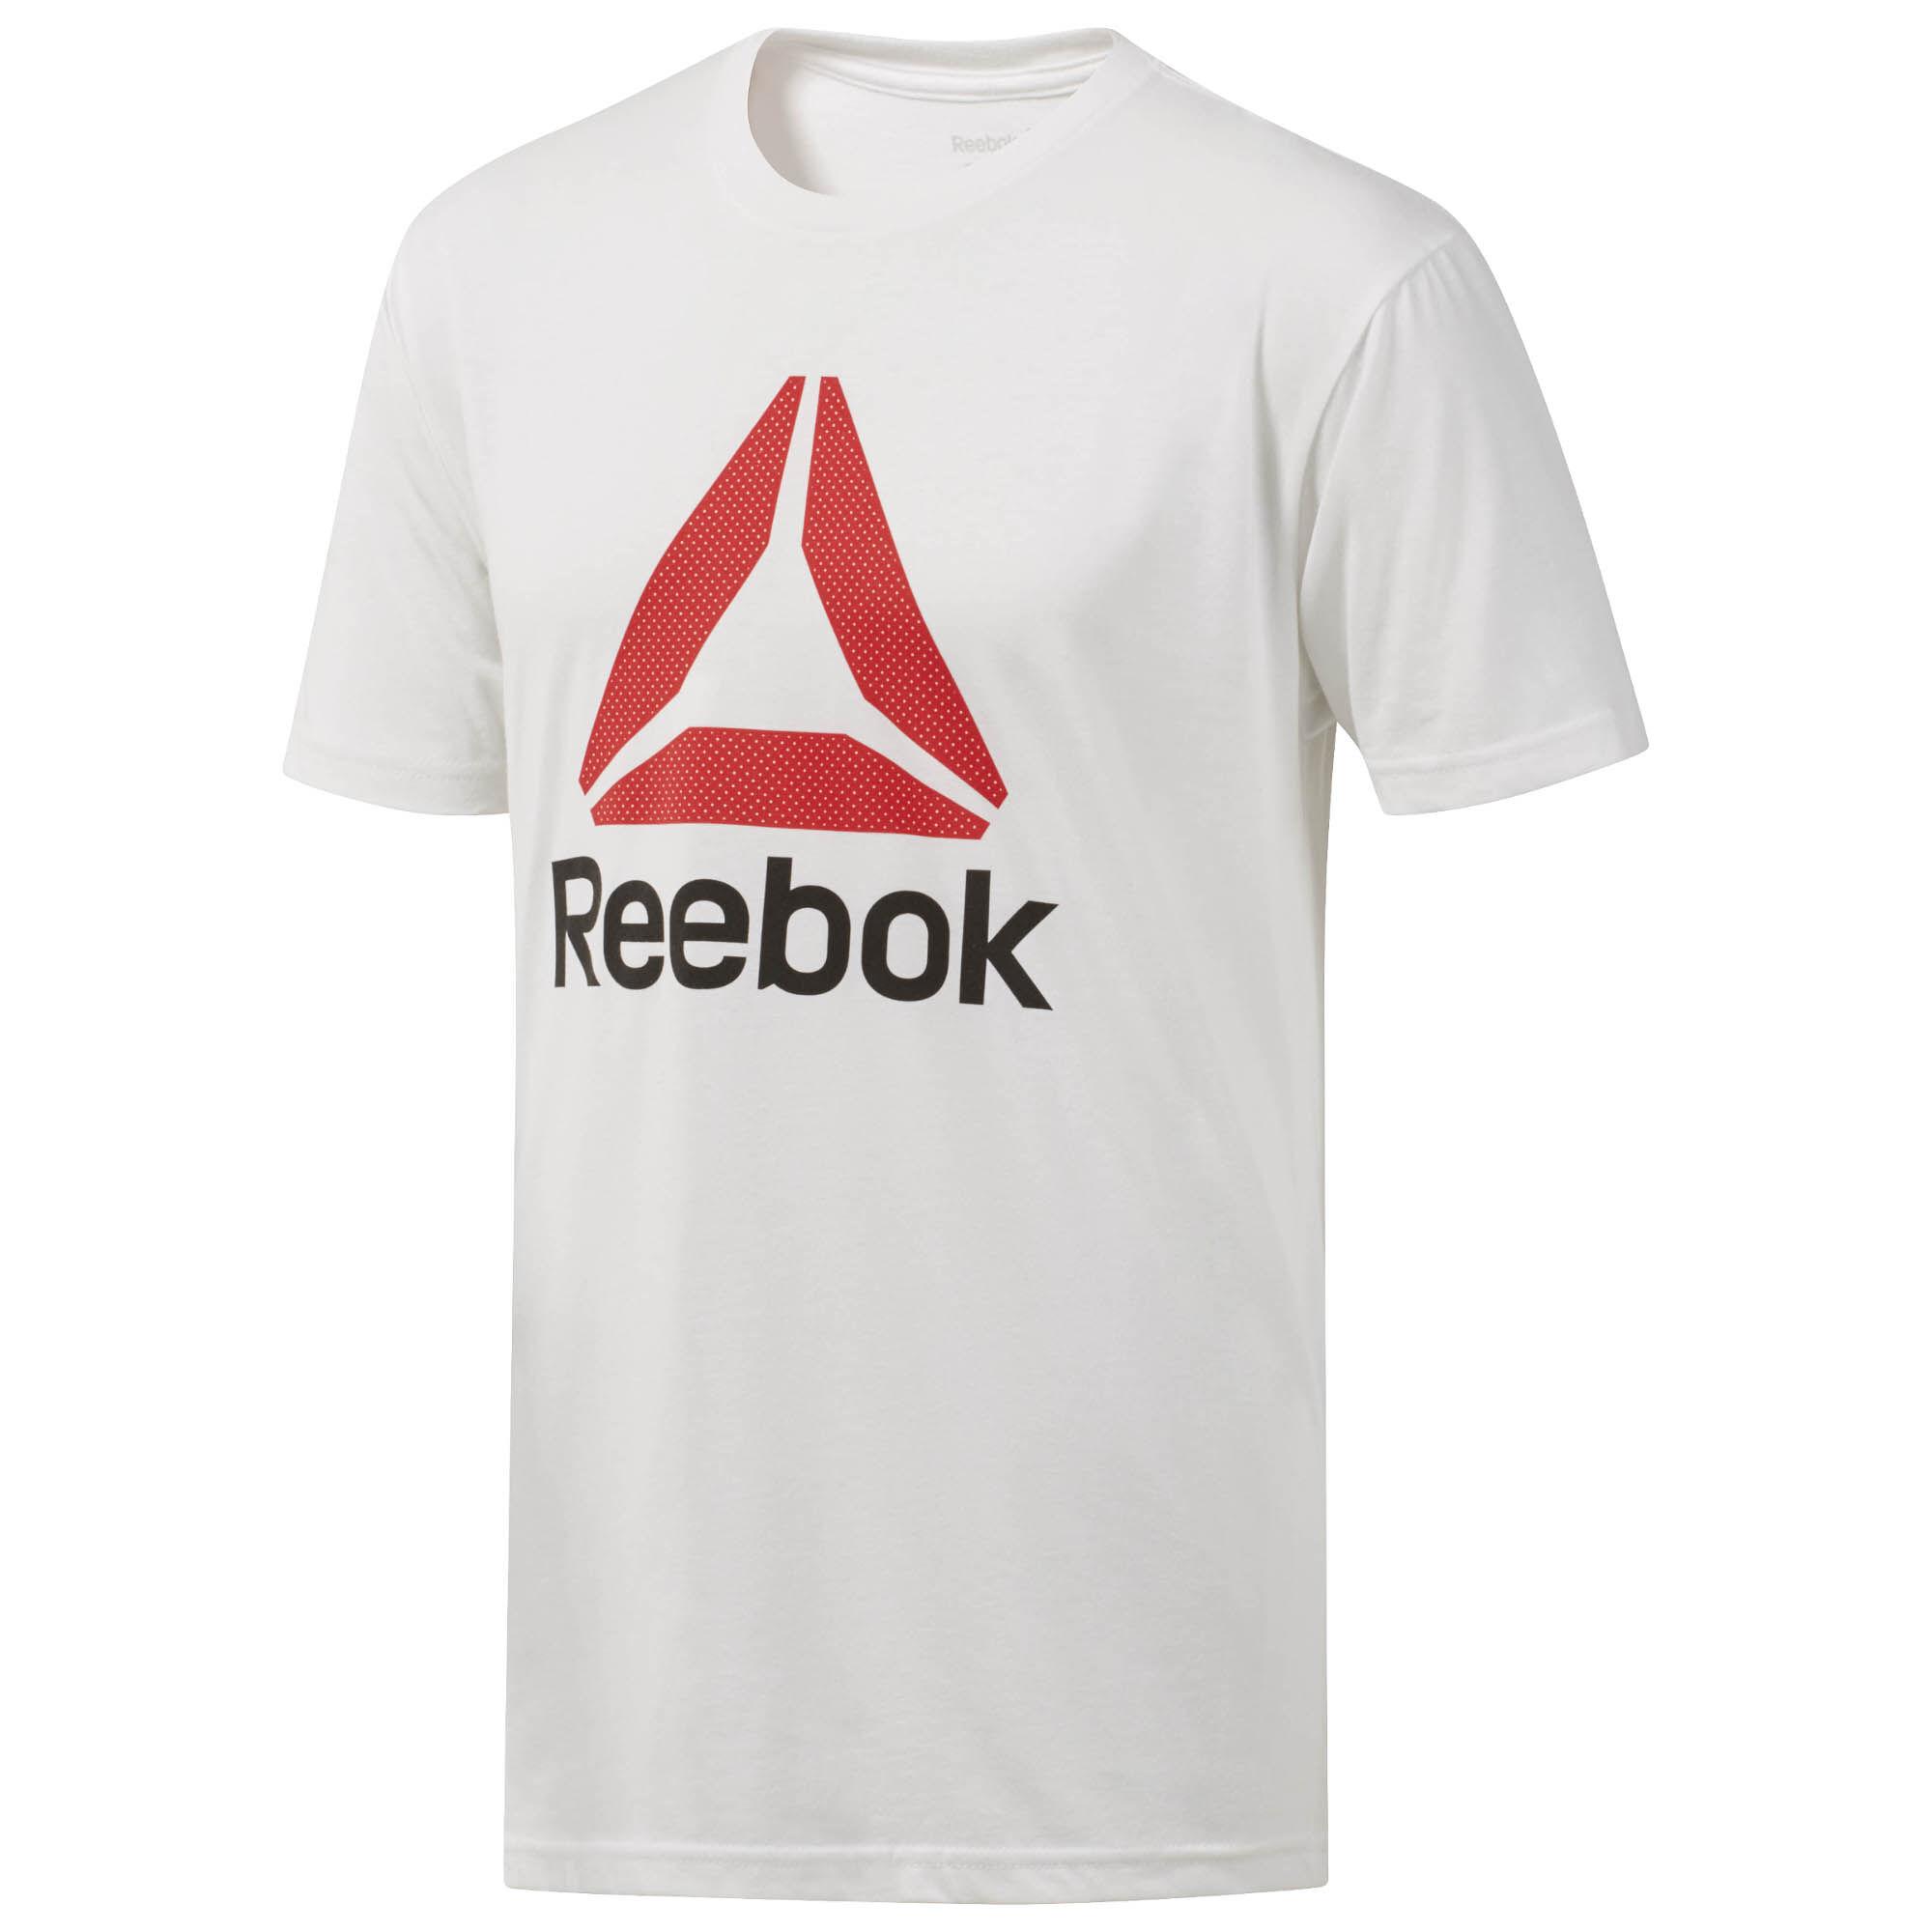 24497ee5e85a2f Buy cheap reebok t shirt womens   OFF39% Discounted